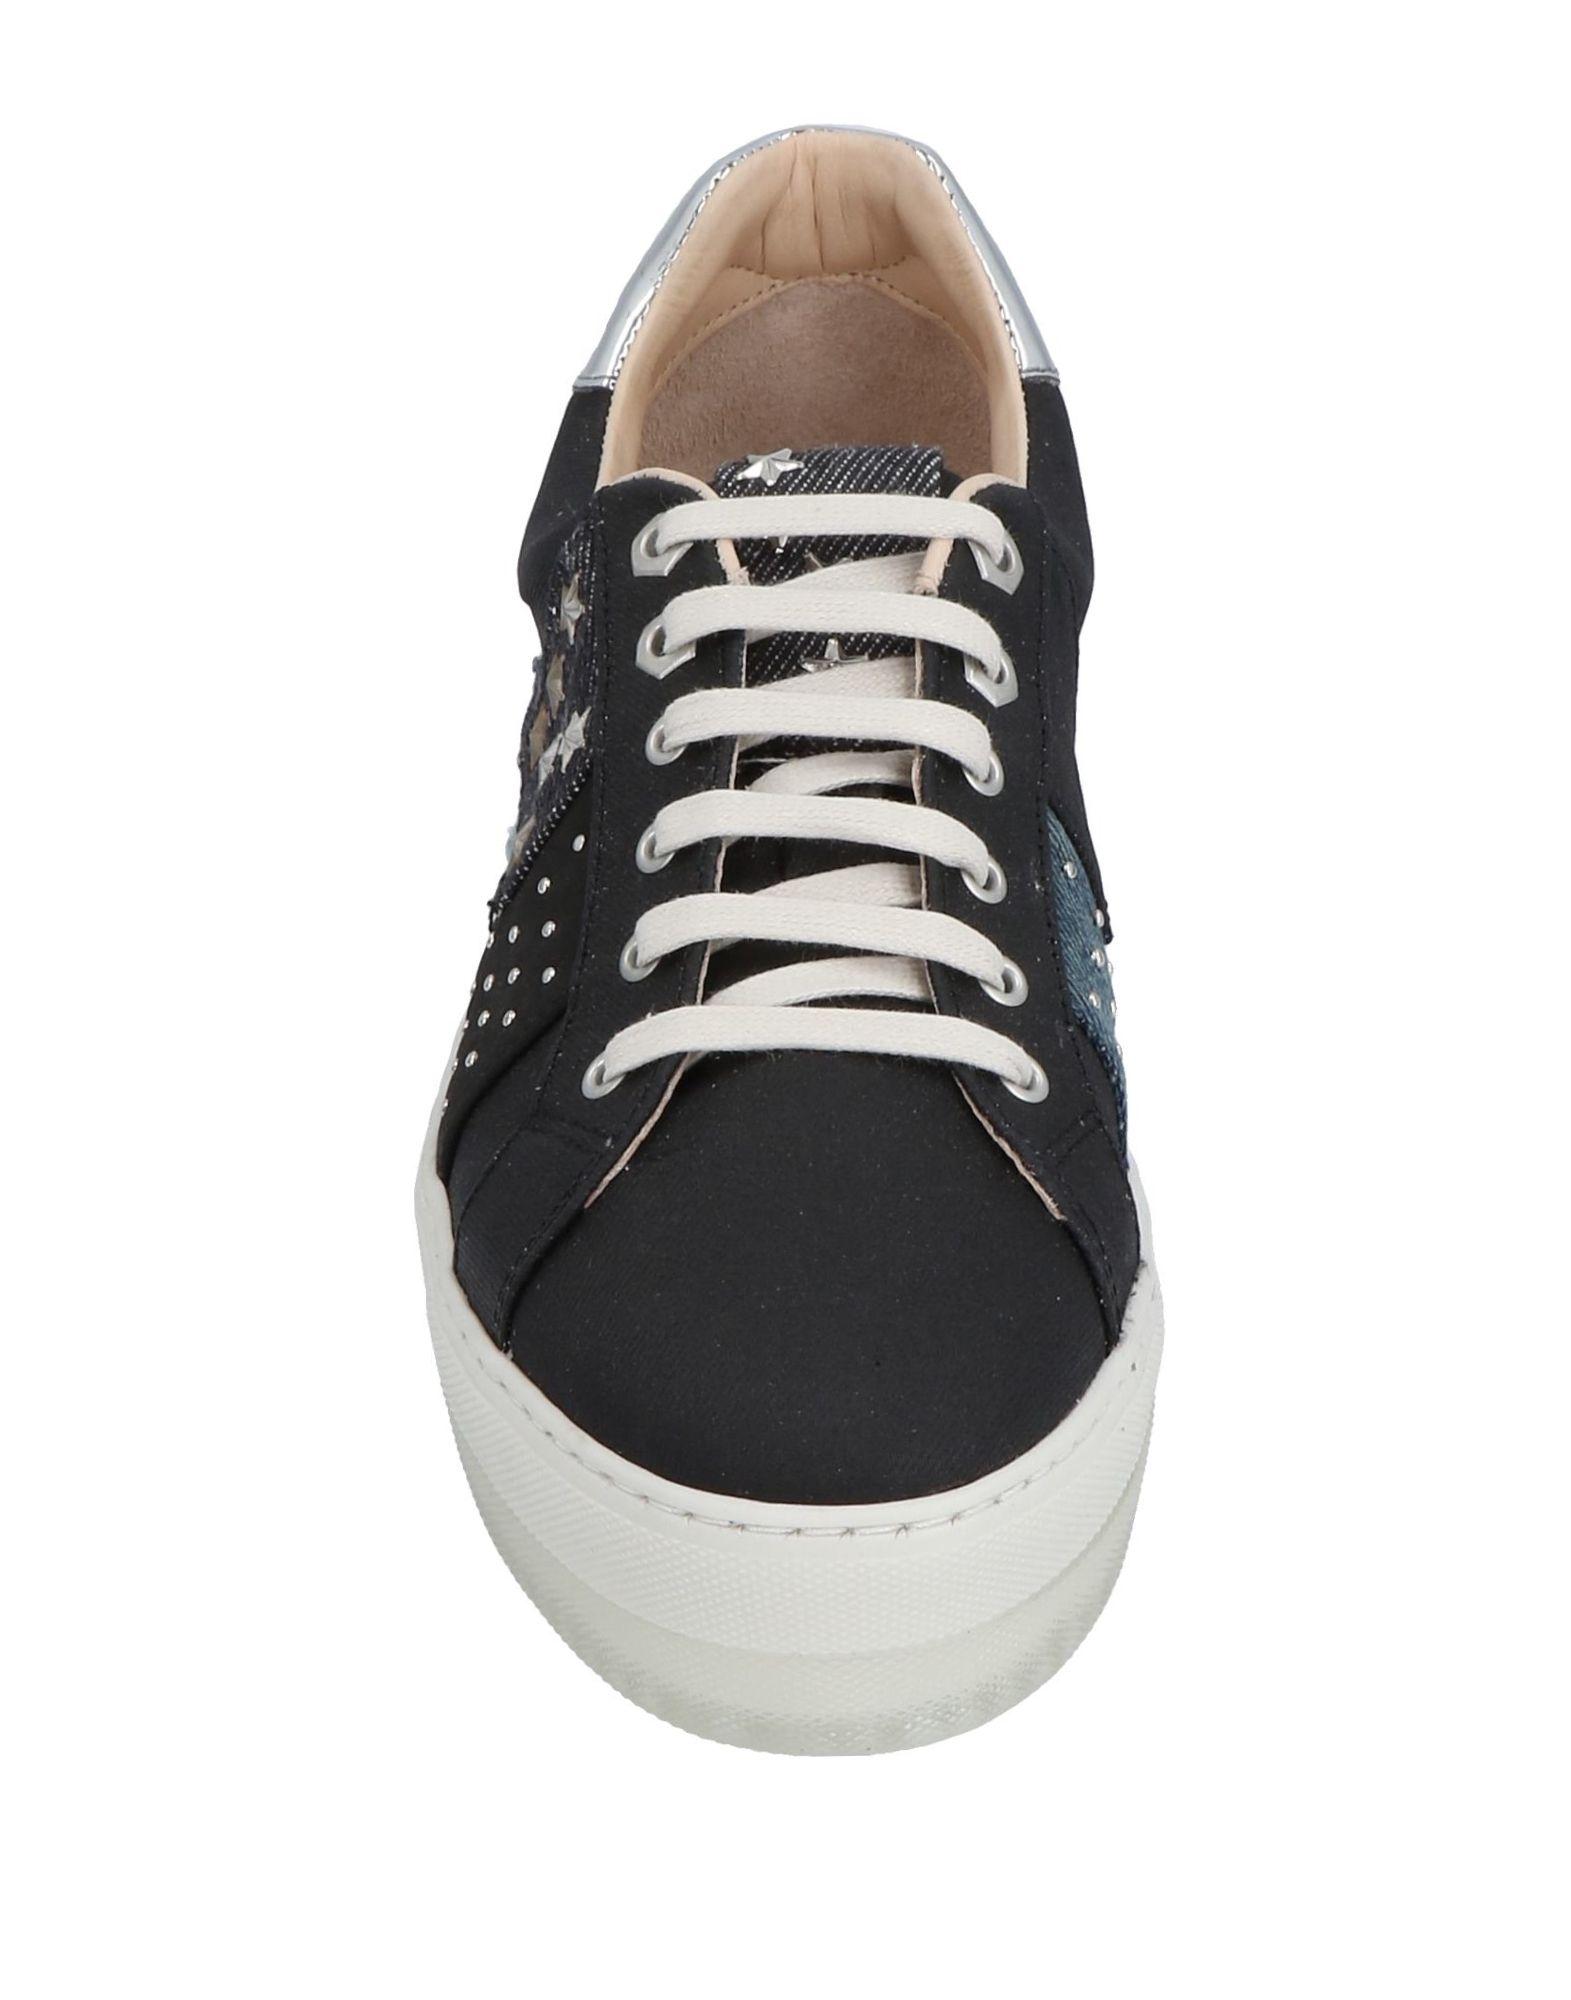 Diesel Sneakers Damen Qualität  11496079NS Gute Qualität Damen beliebte Schuhe bdce39